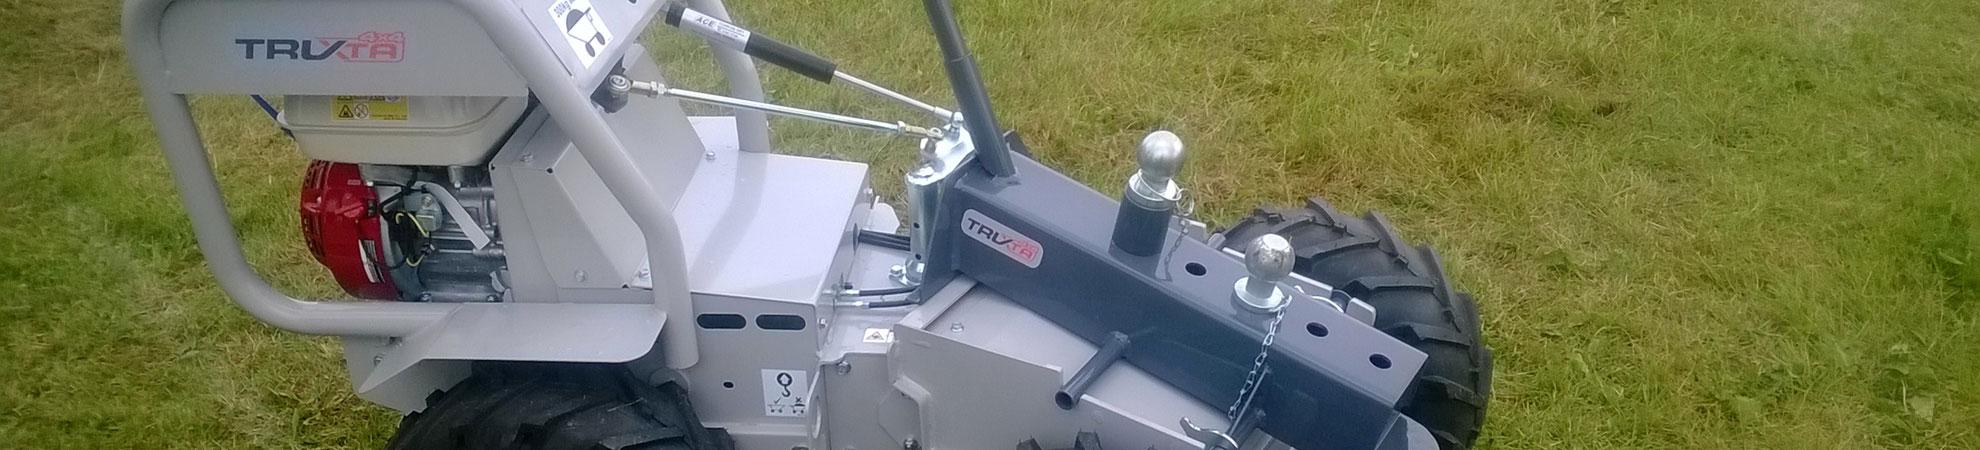 TRUXTA powered mini dumpers | Deeleys Official Avant Hire